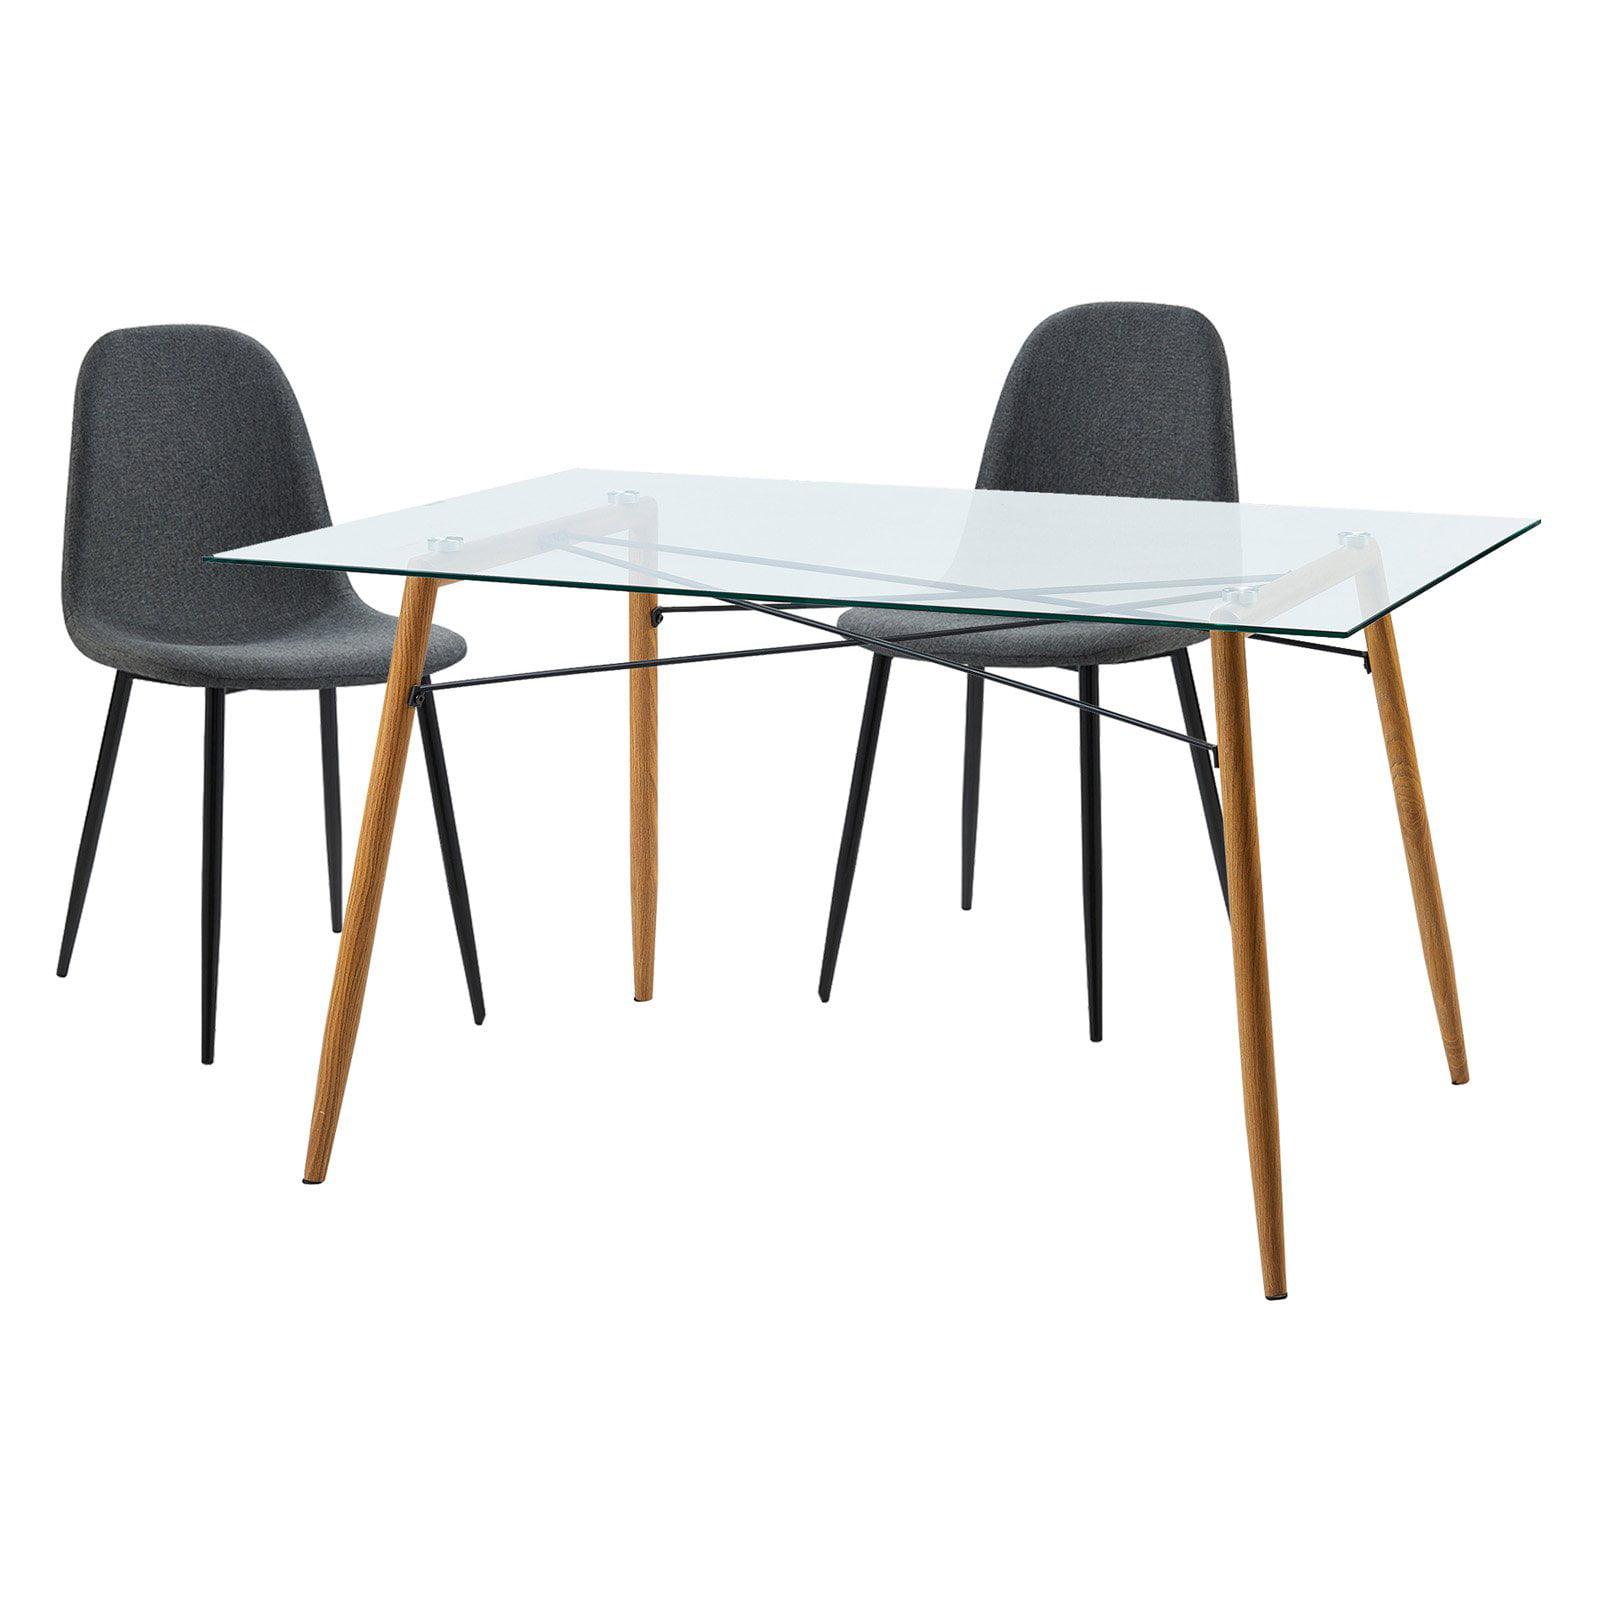 Versanora Minimalista Table with Set of 2 Chairs